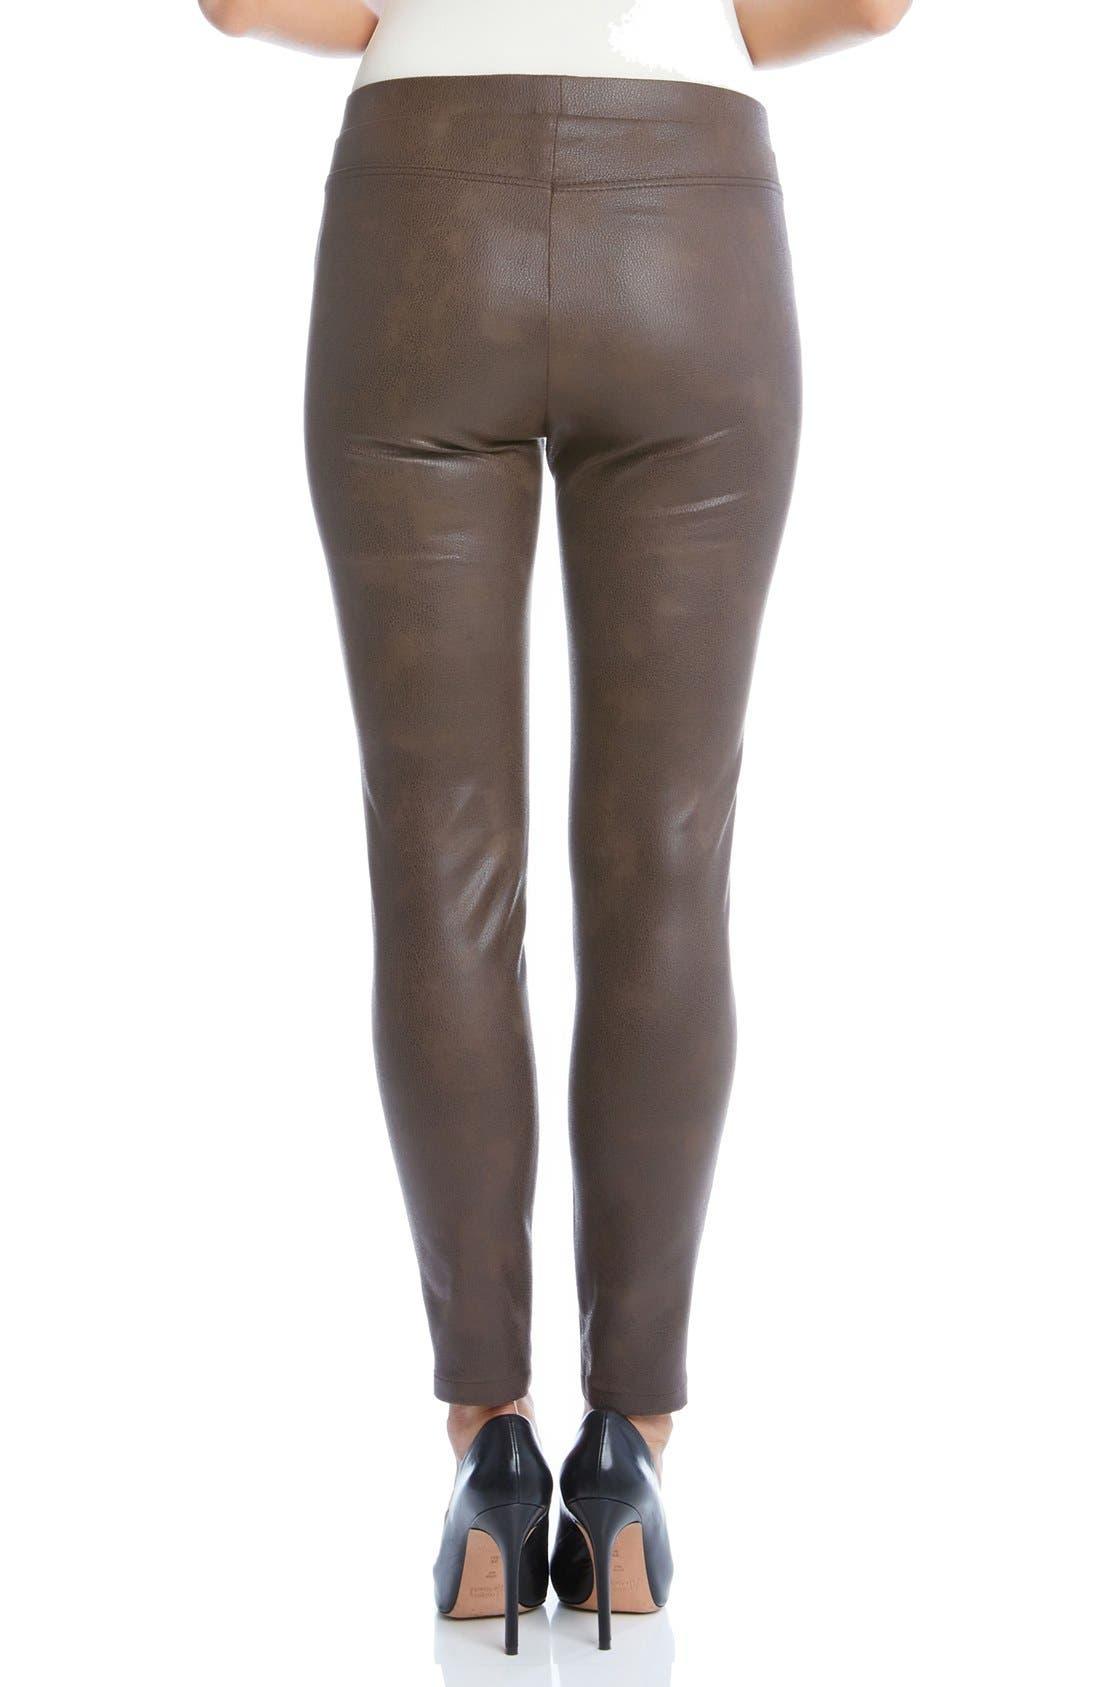 Karen Karen Stretch Faux Leather Skinny Pants,                             Alternate thumbnail 2, color,                             200